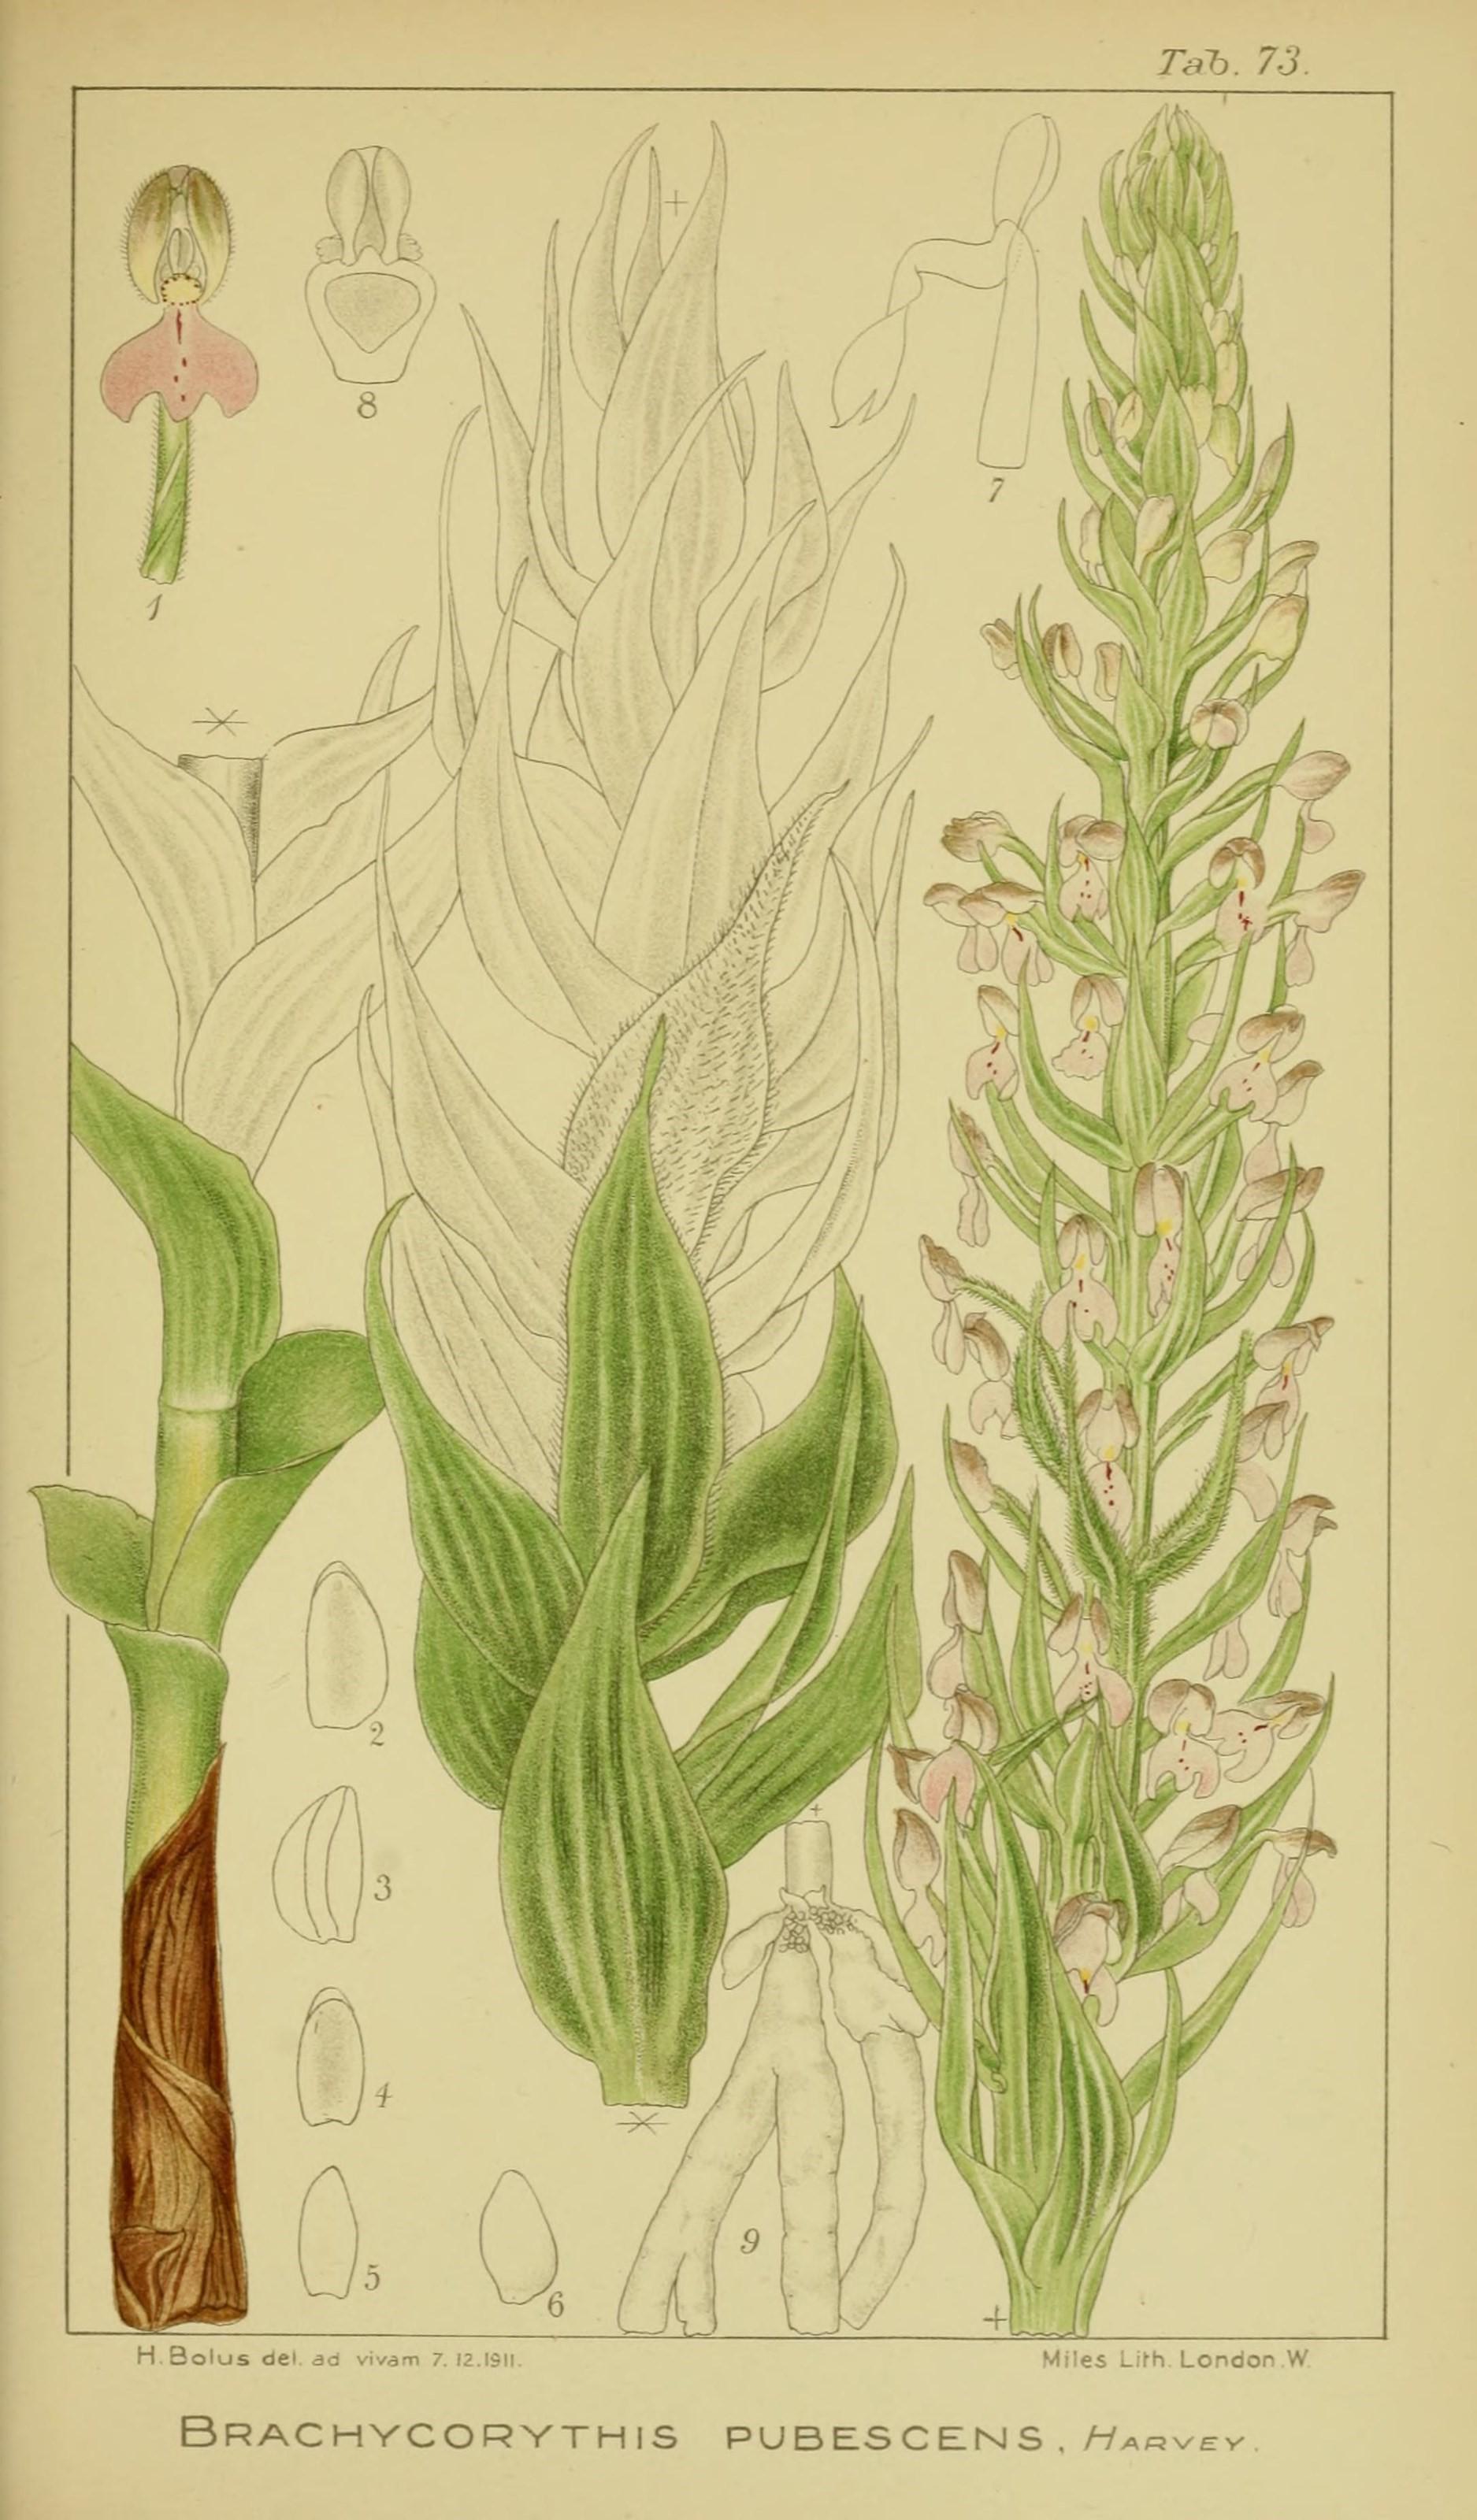 Image of Brachycorythis